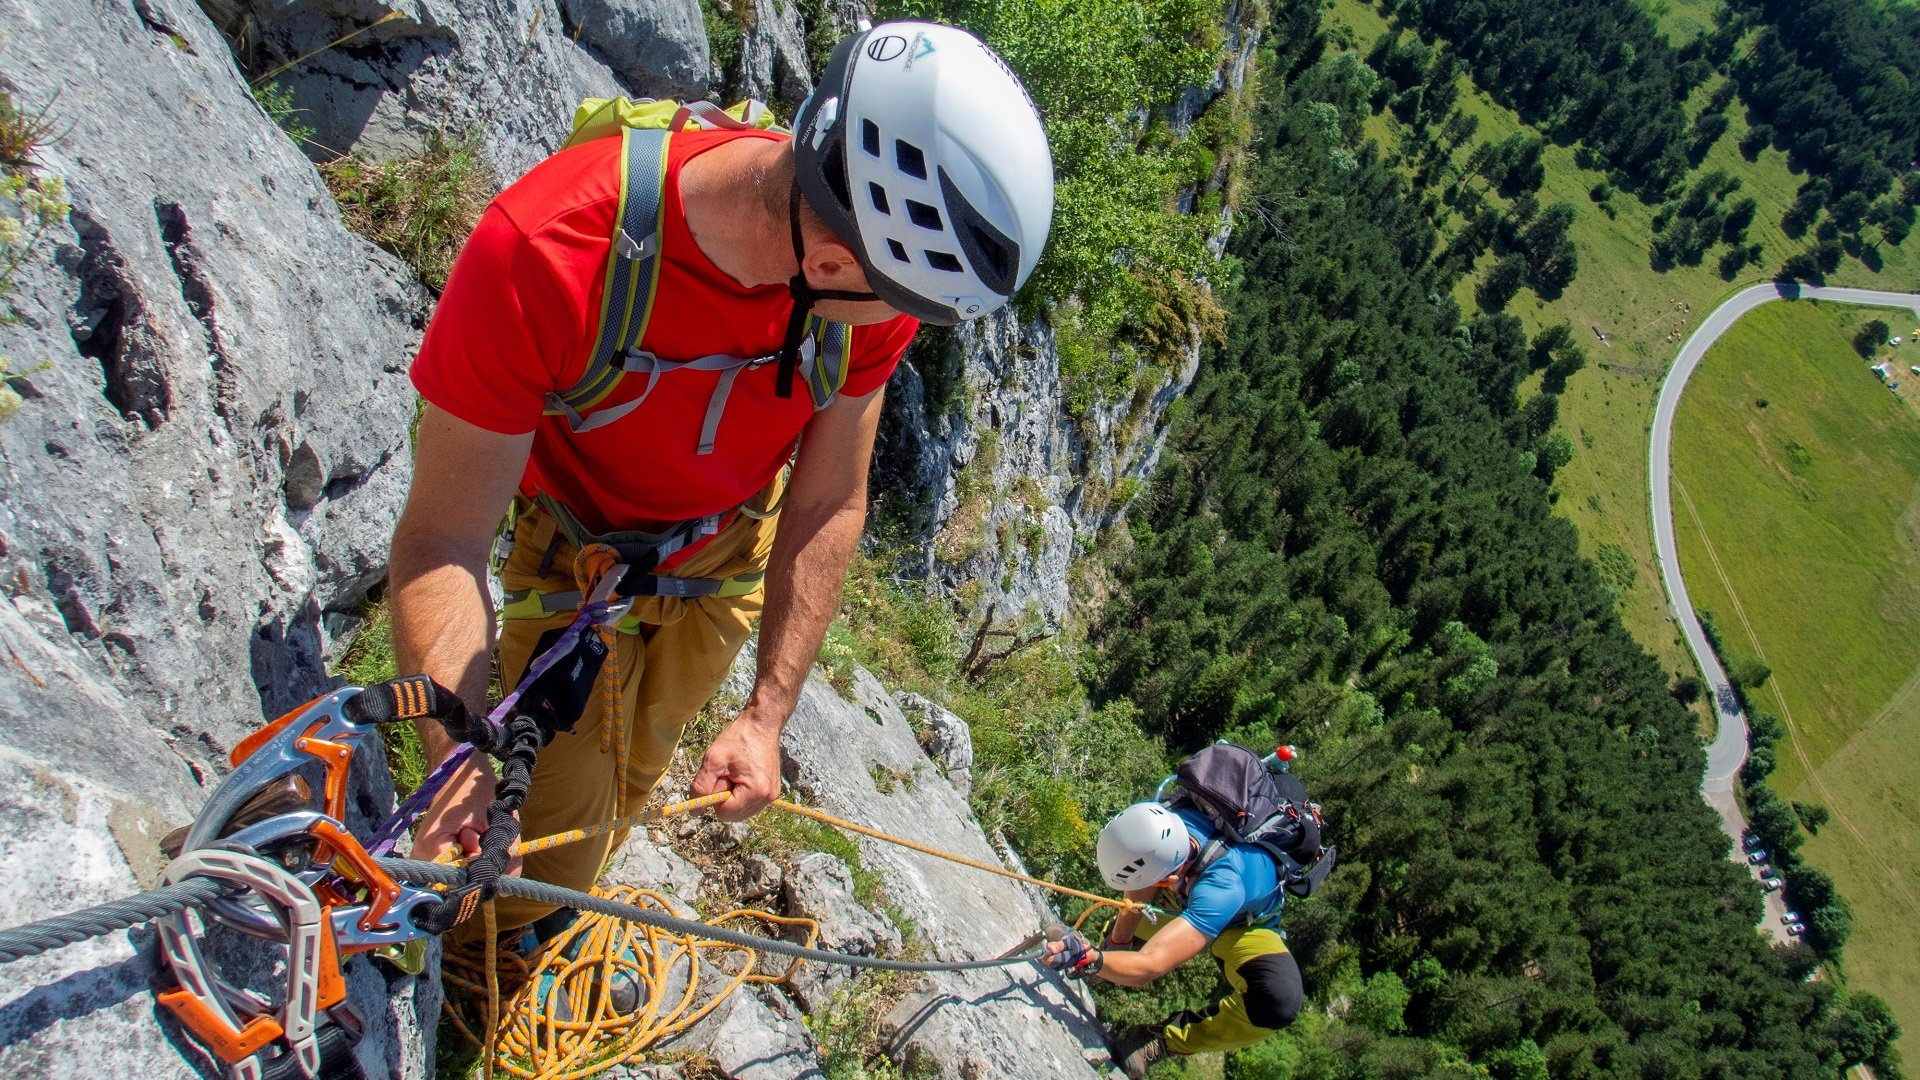 climbingacademy-kurs-via-ferrata